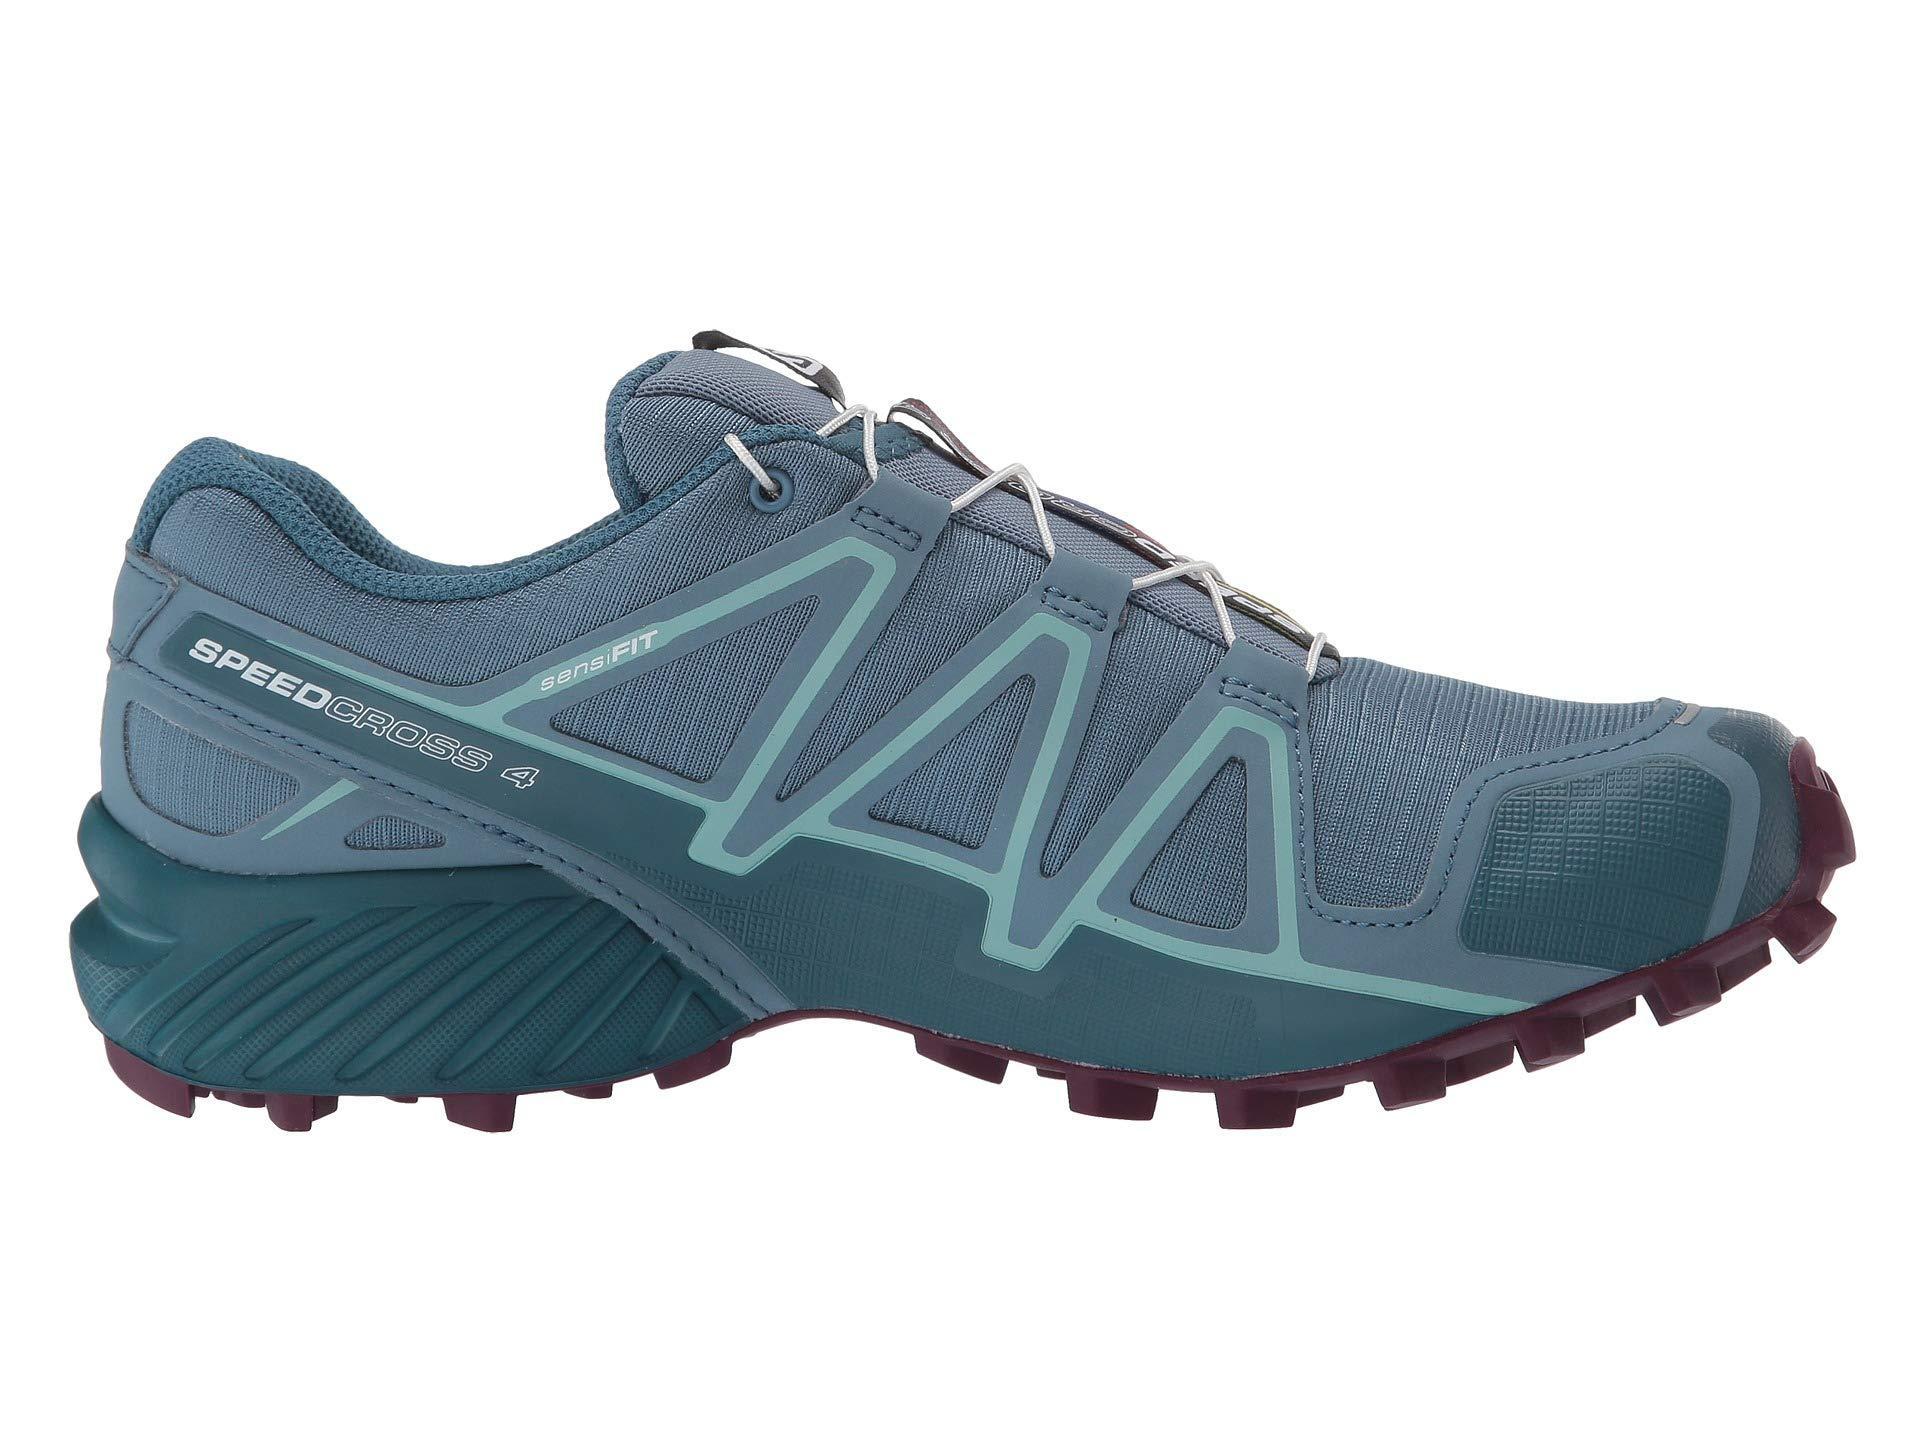 salomon speedcross 4 gtx women's trail running shoes 1970